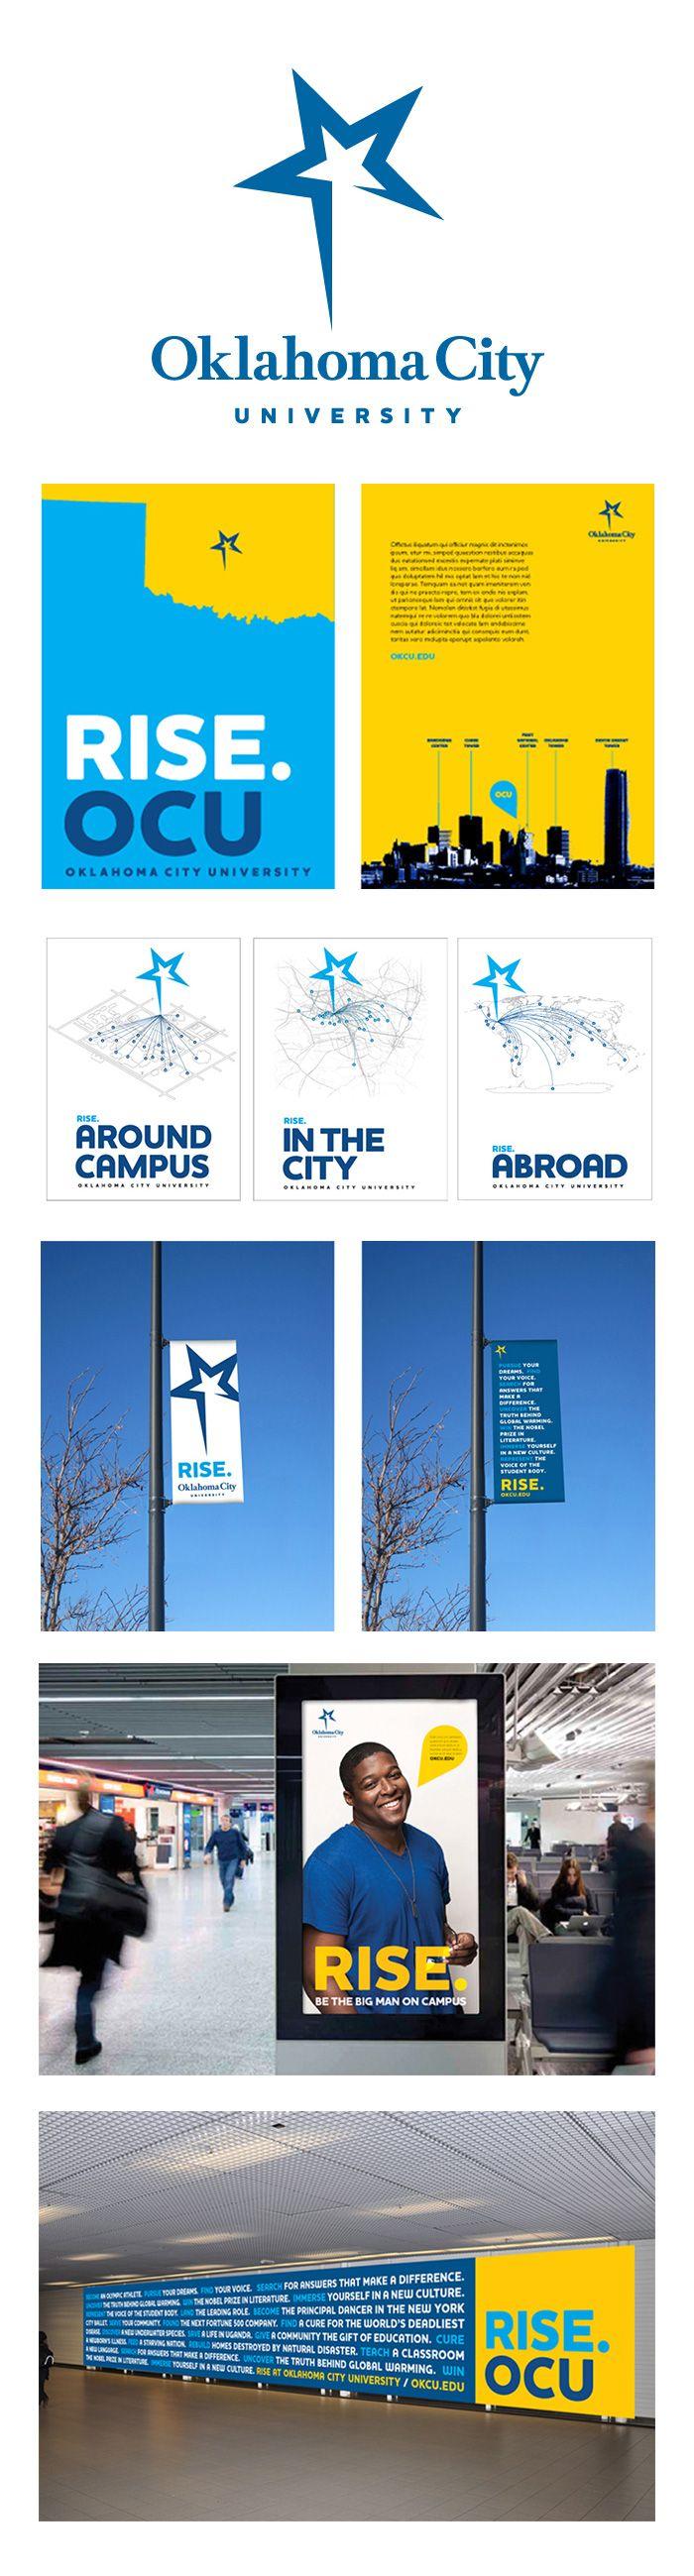 Oklahoma City University branding par Pentagram